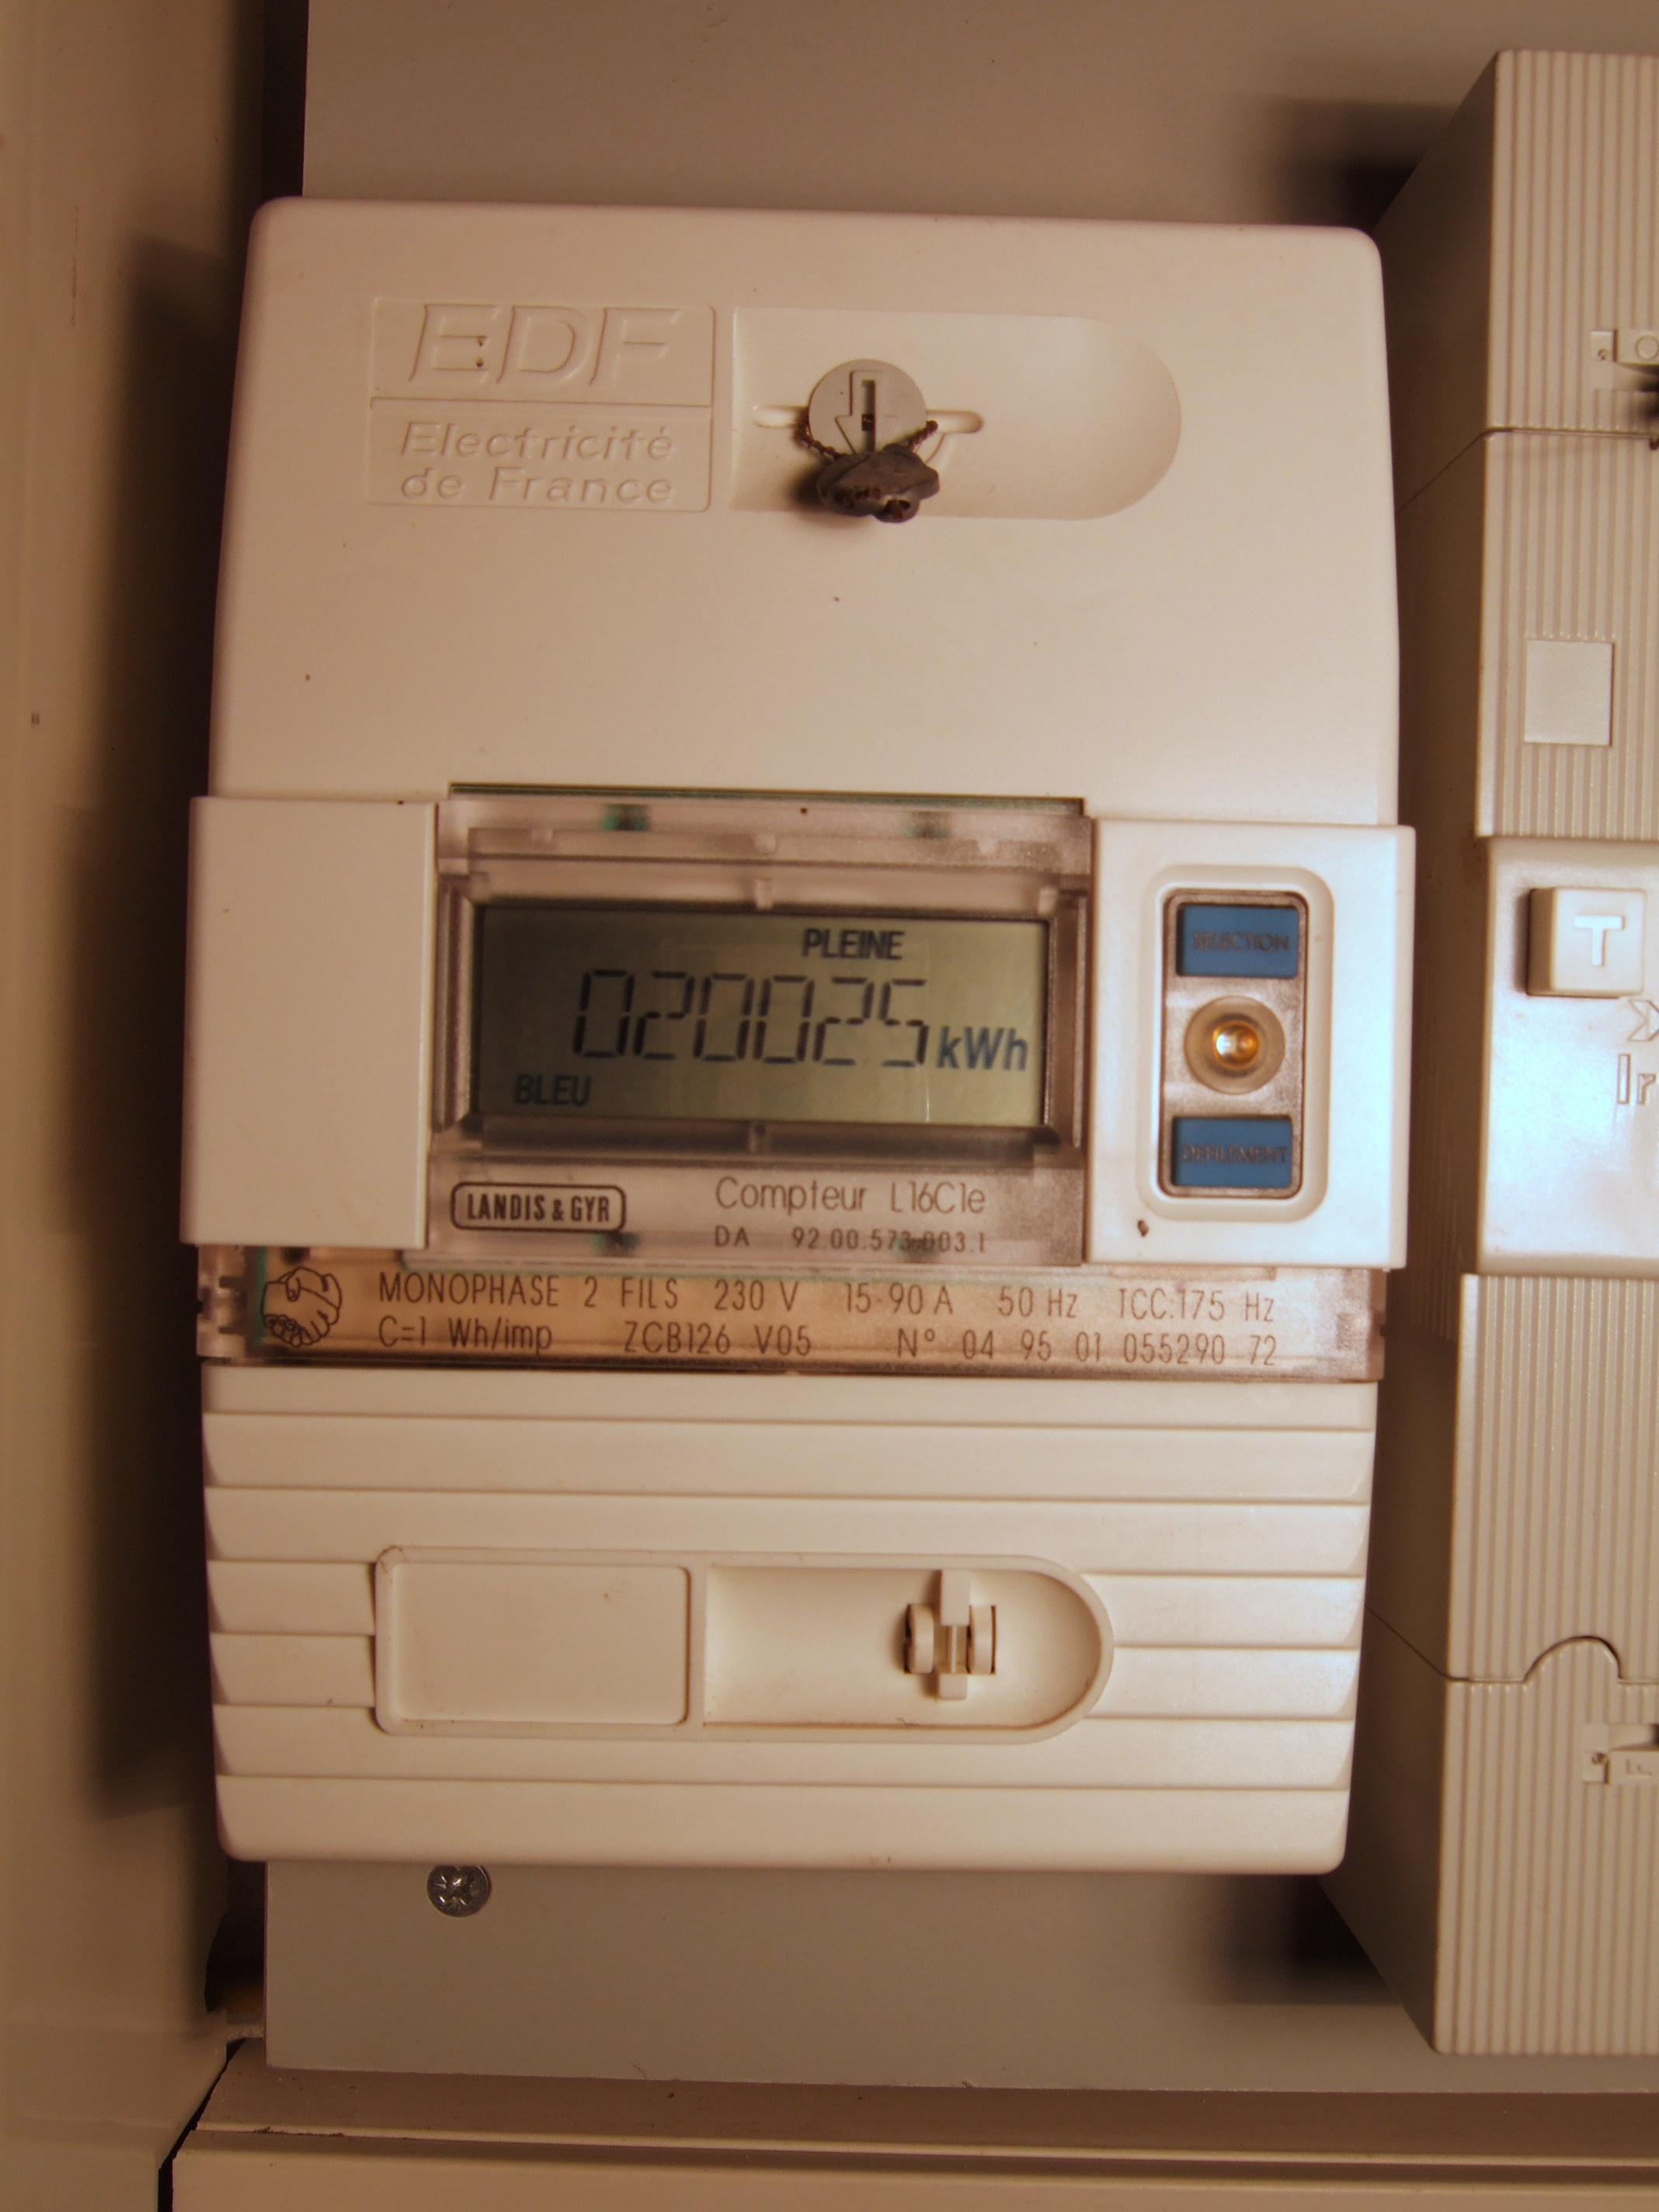 Electricity Meter: Jump Electricity Meter